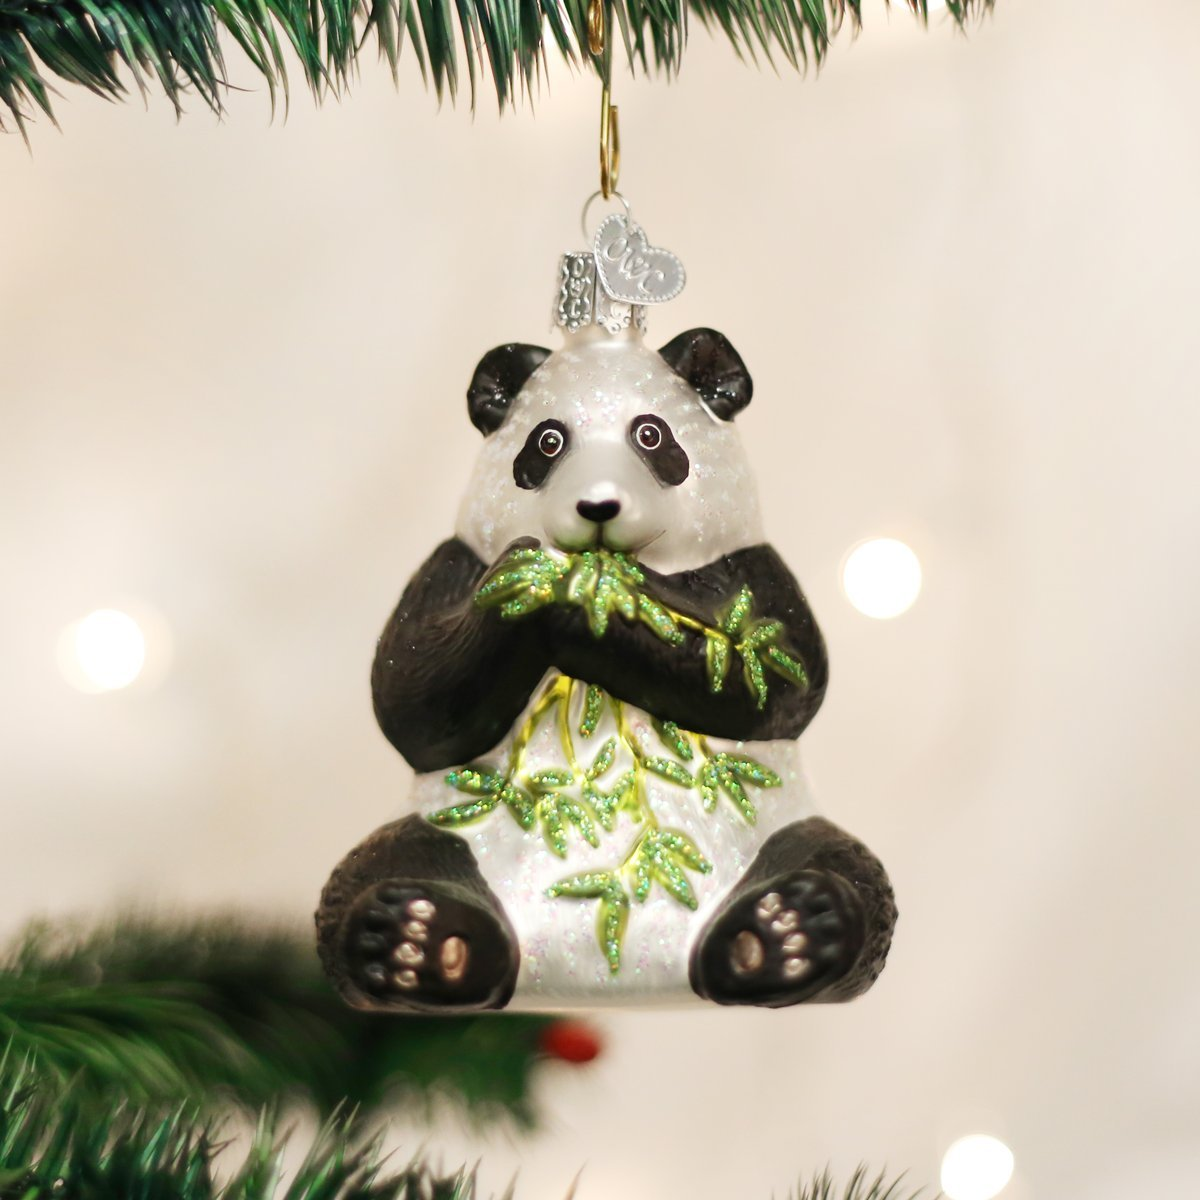 Amazon.com: Old World Christmas Panda Glass Blown Ornament: Home ...